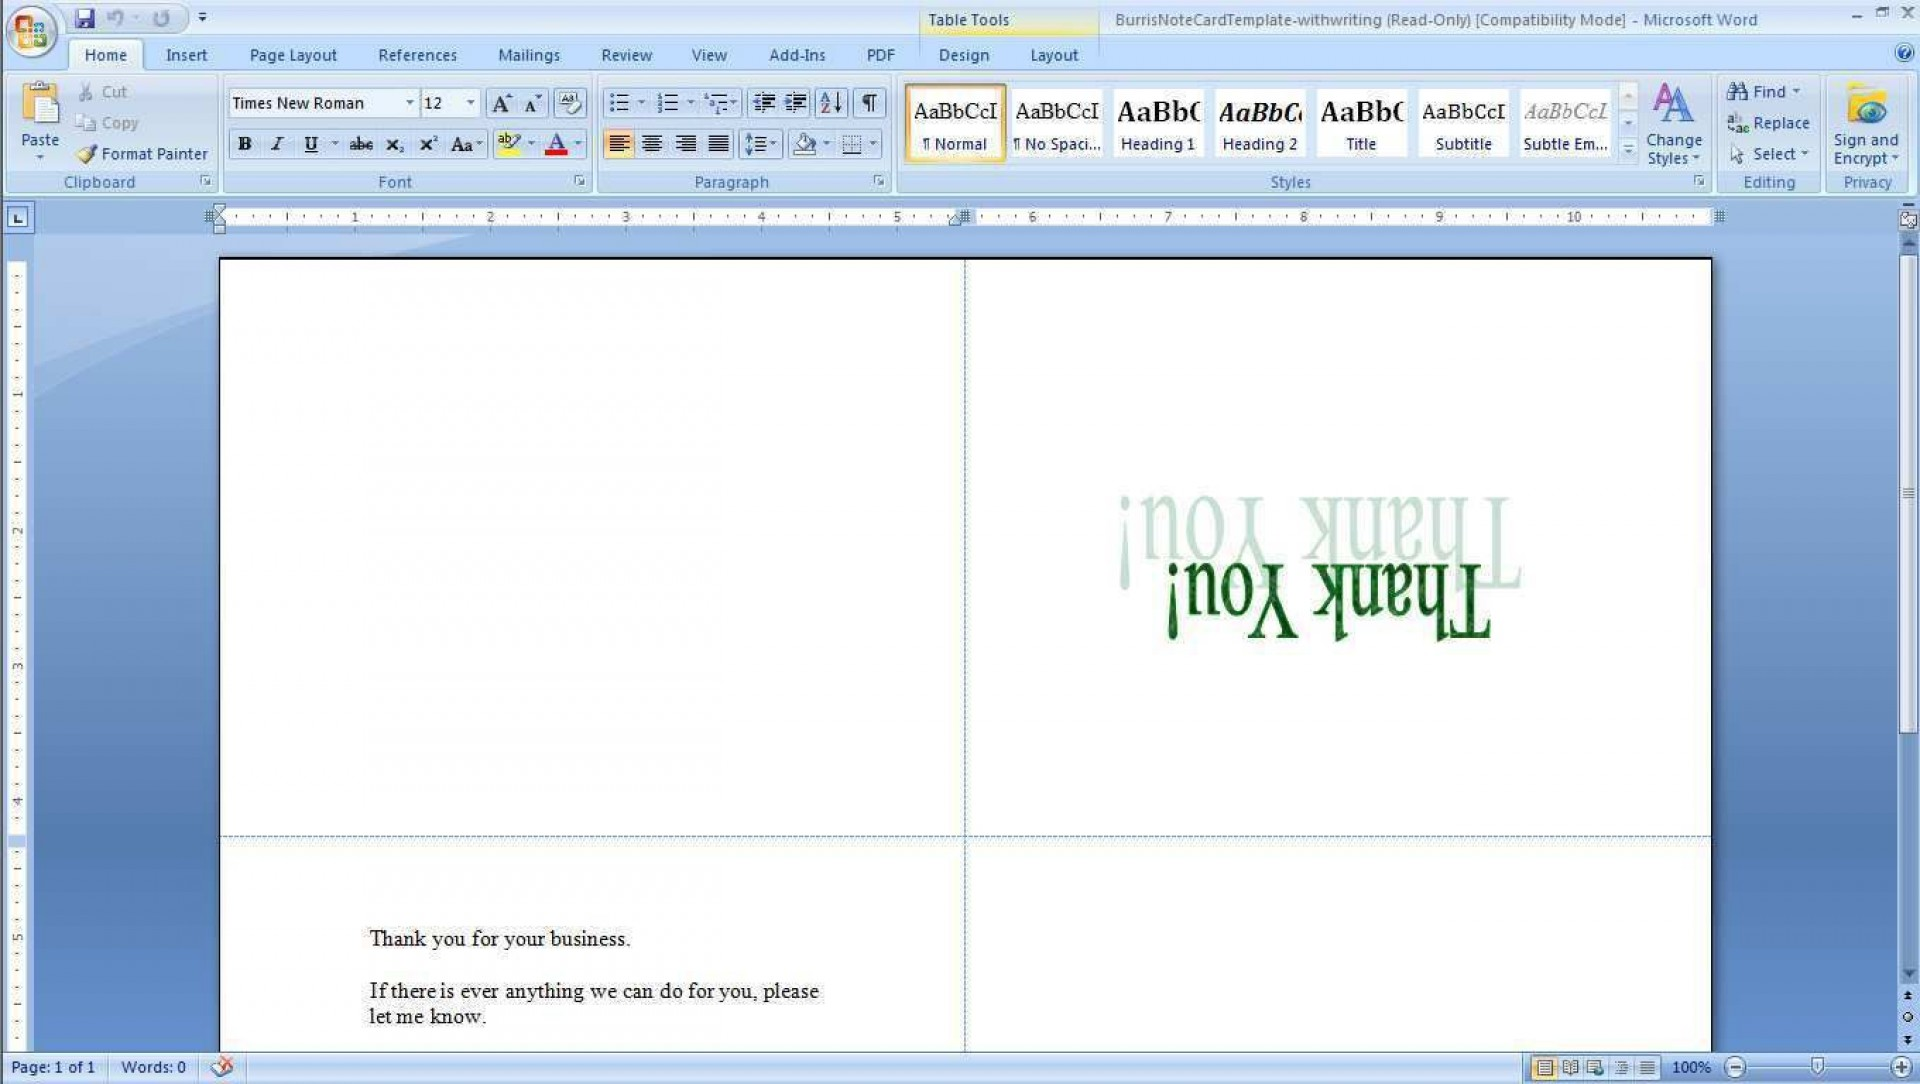 002 Marvelou Microsoft Word Greeting Card Template Highest Clarity  Birthday Blank Free 20071920